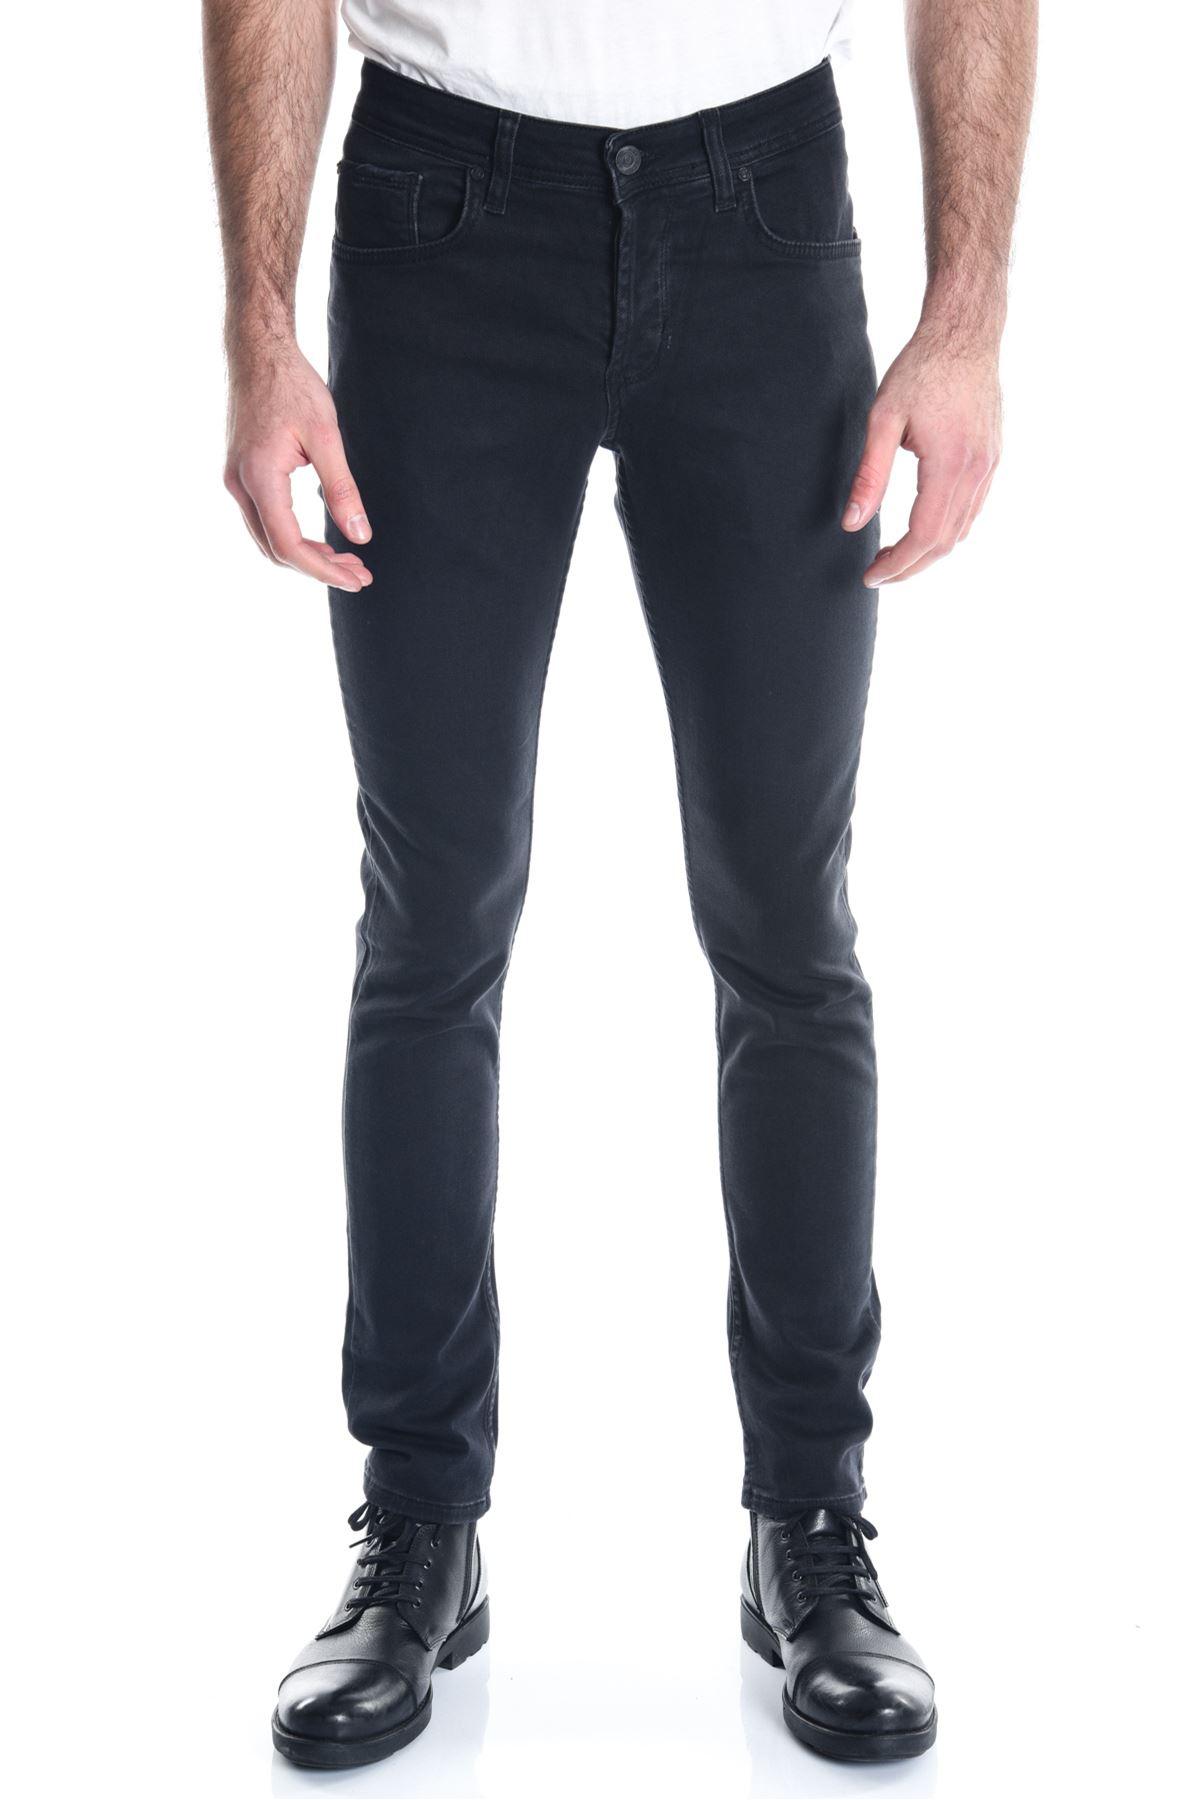 Siyah Sade Örme Armürlü Erkek Kot Pantolon